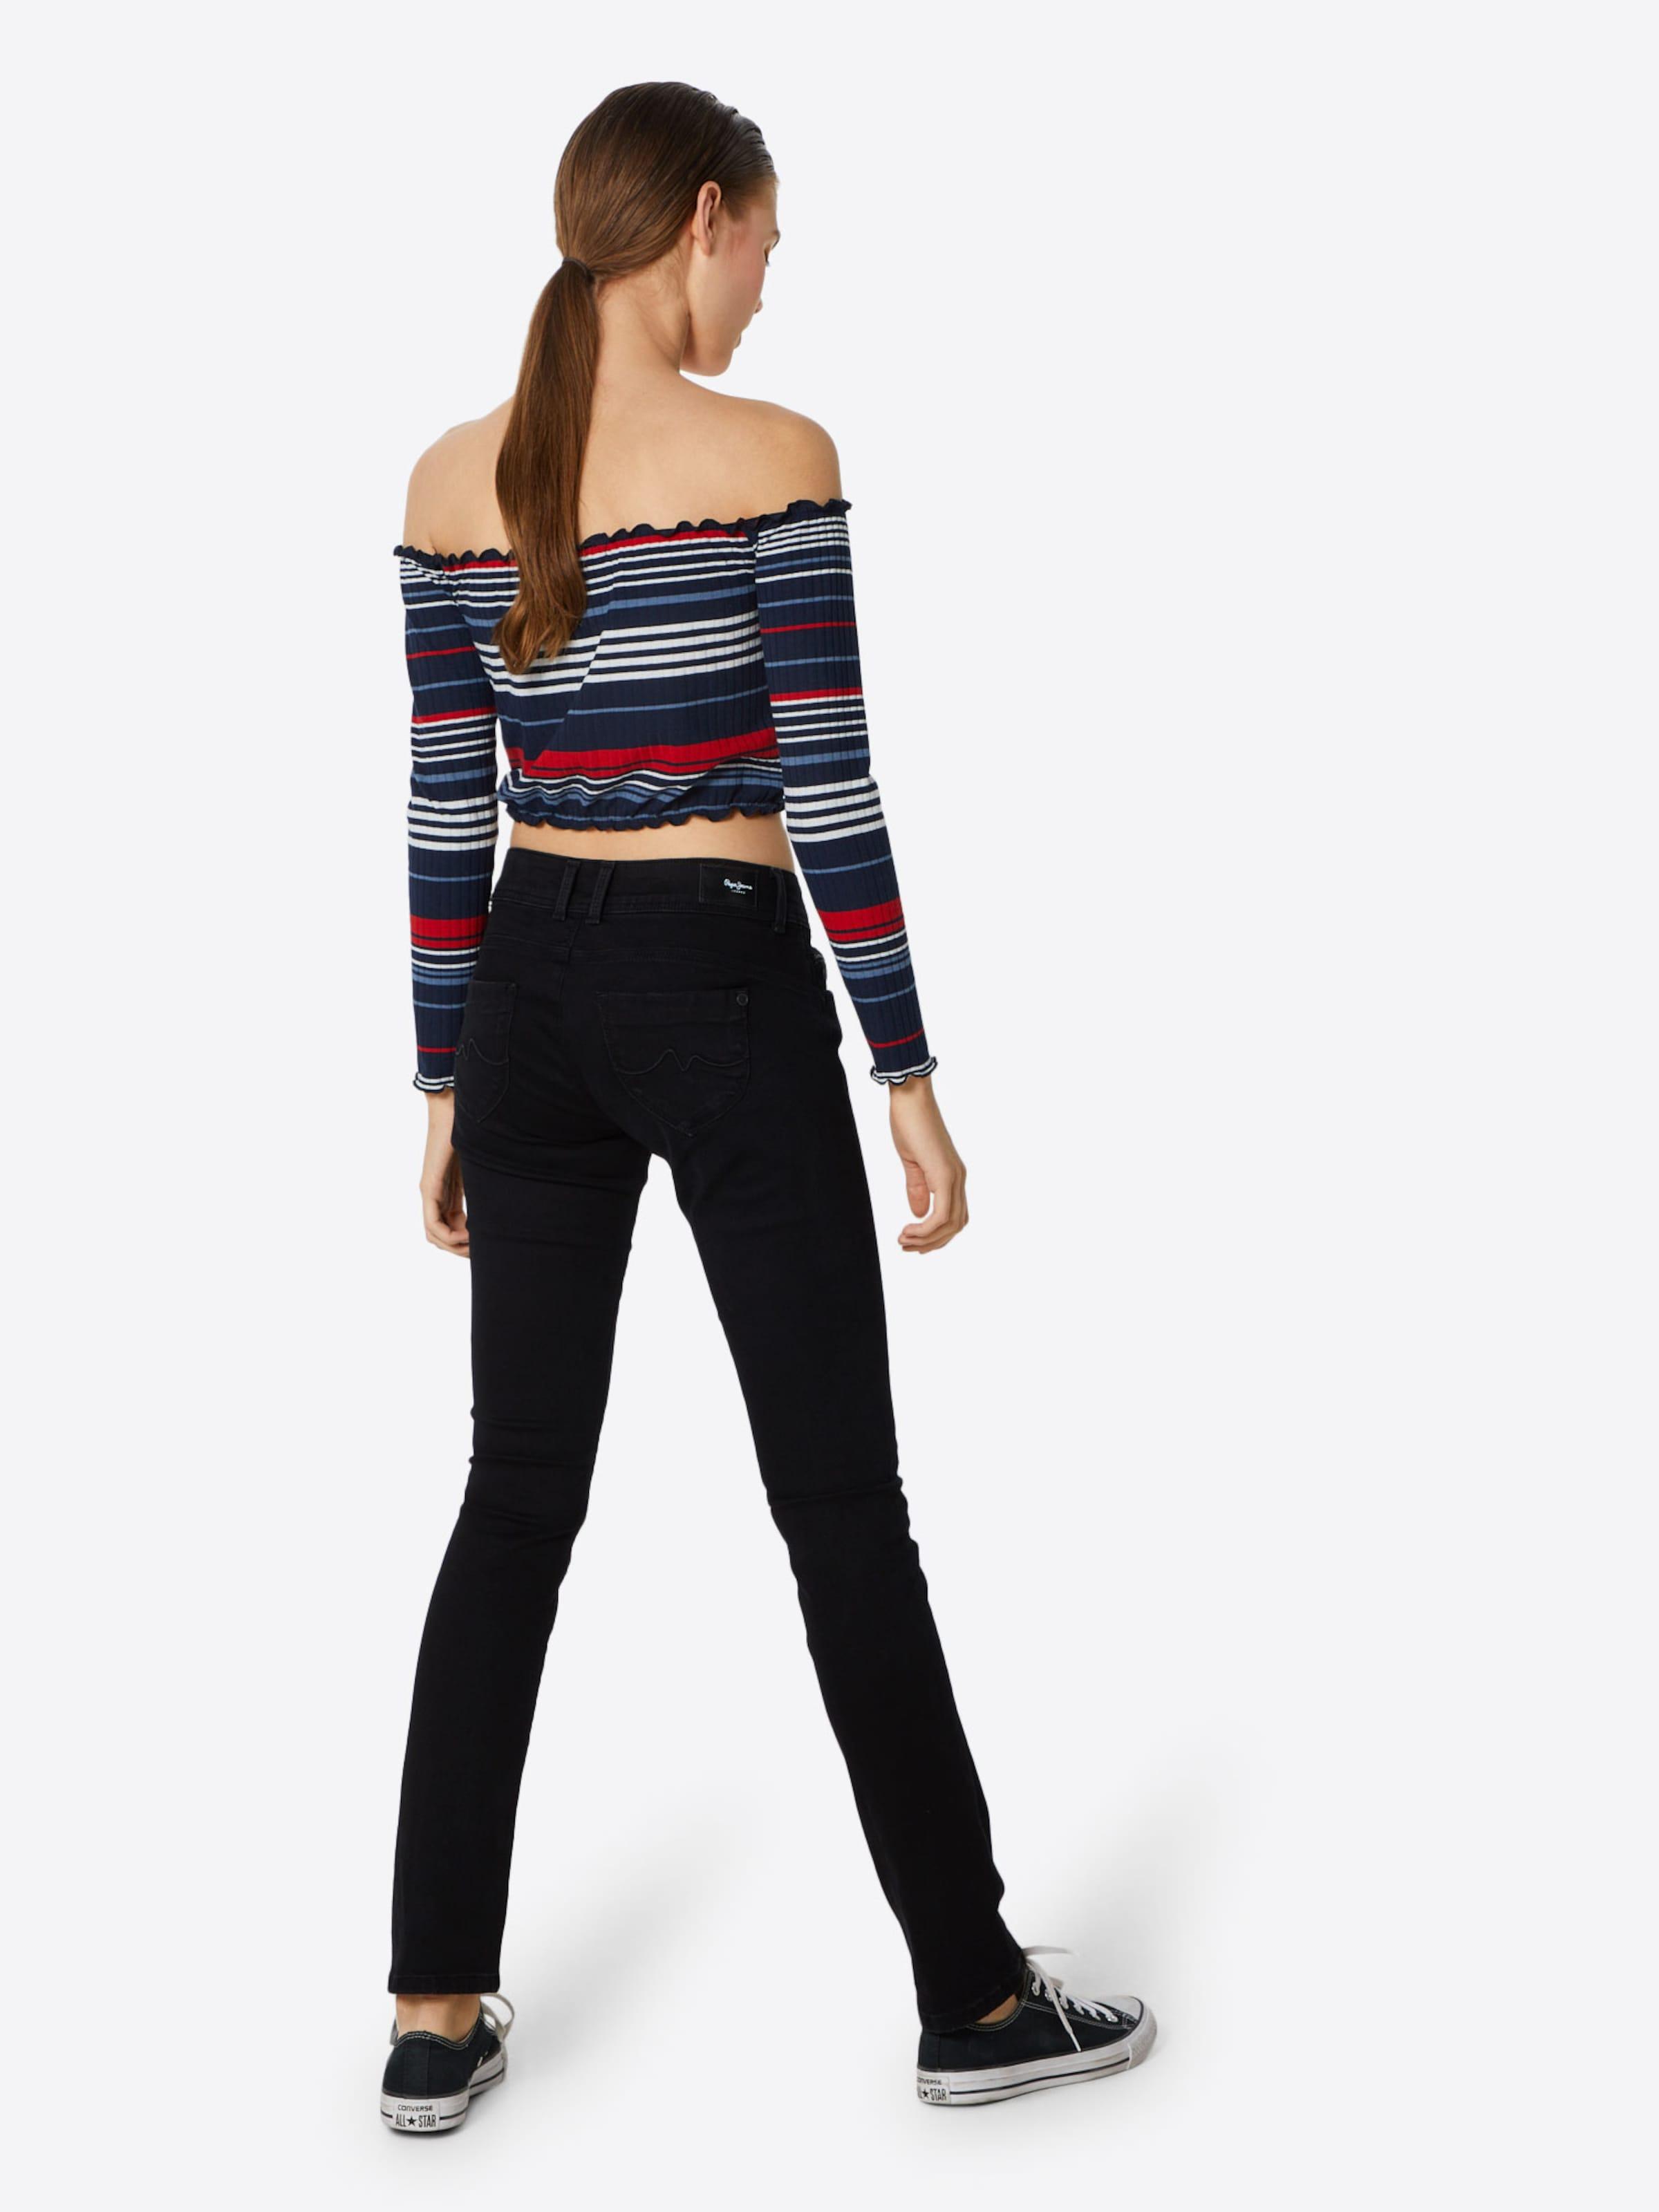 Jeans In Black Brooke' 'new Pepe Denim AR5jL4